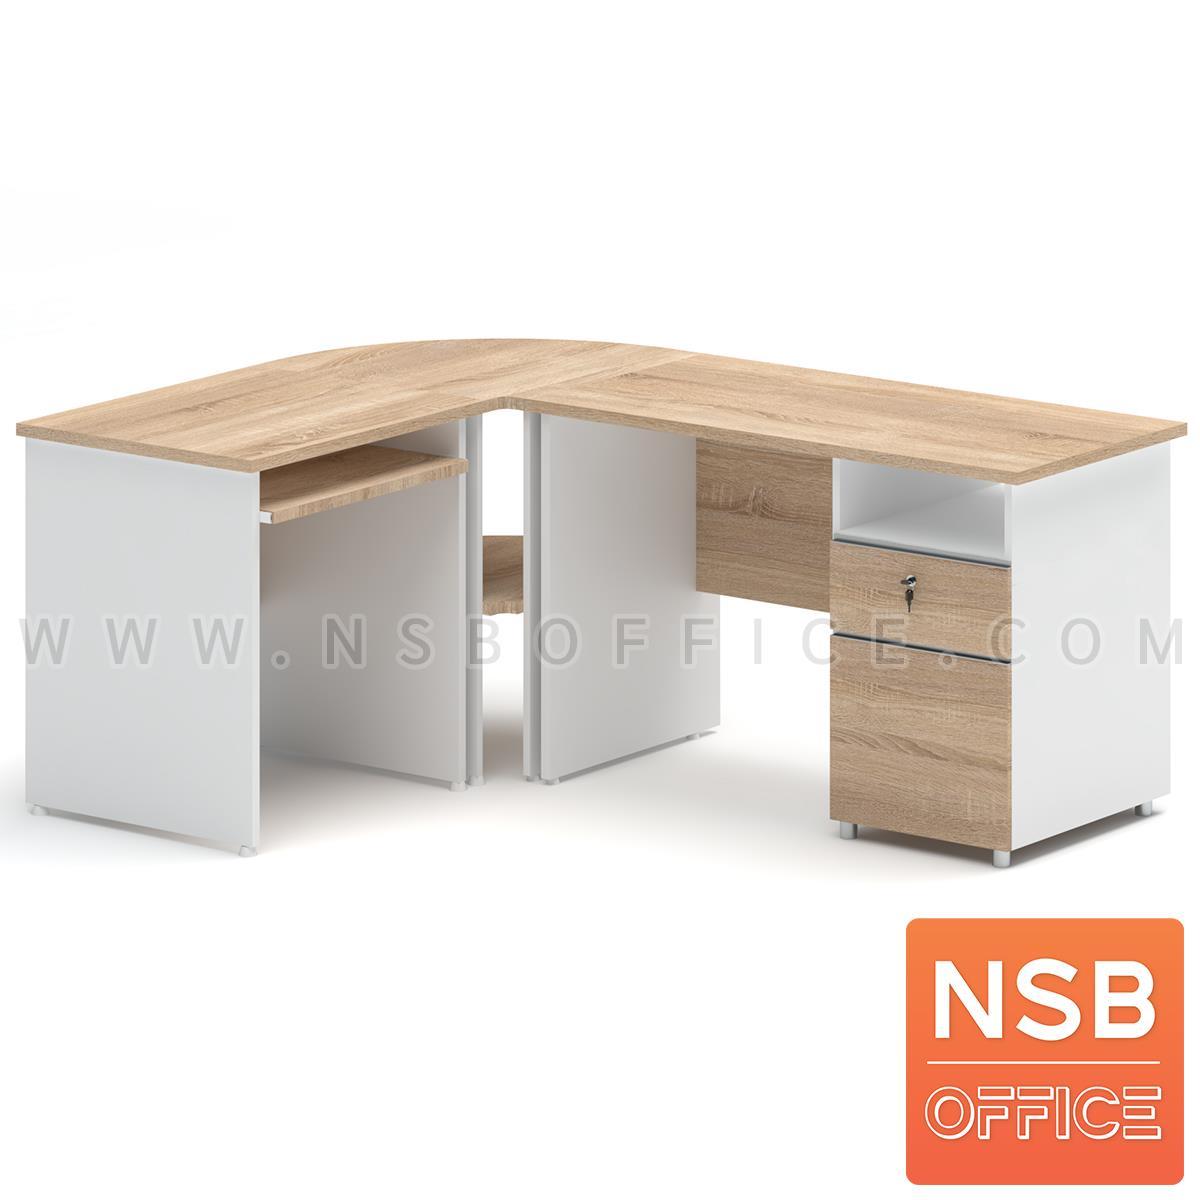 A21A018:โต๊ะทำงานตัวแอล 2 ลิ้นชัก รุ่น Spring Flower (สปริงฟลาวเวอร์) ขนาด 180W1*140W2 cm. พร้อมรางคีบอร์ด สีเนเจอร์ทีค-ขาว